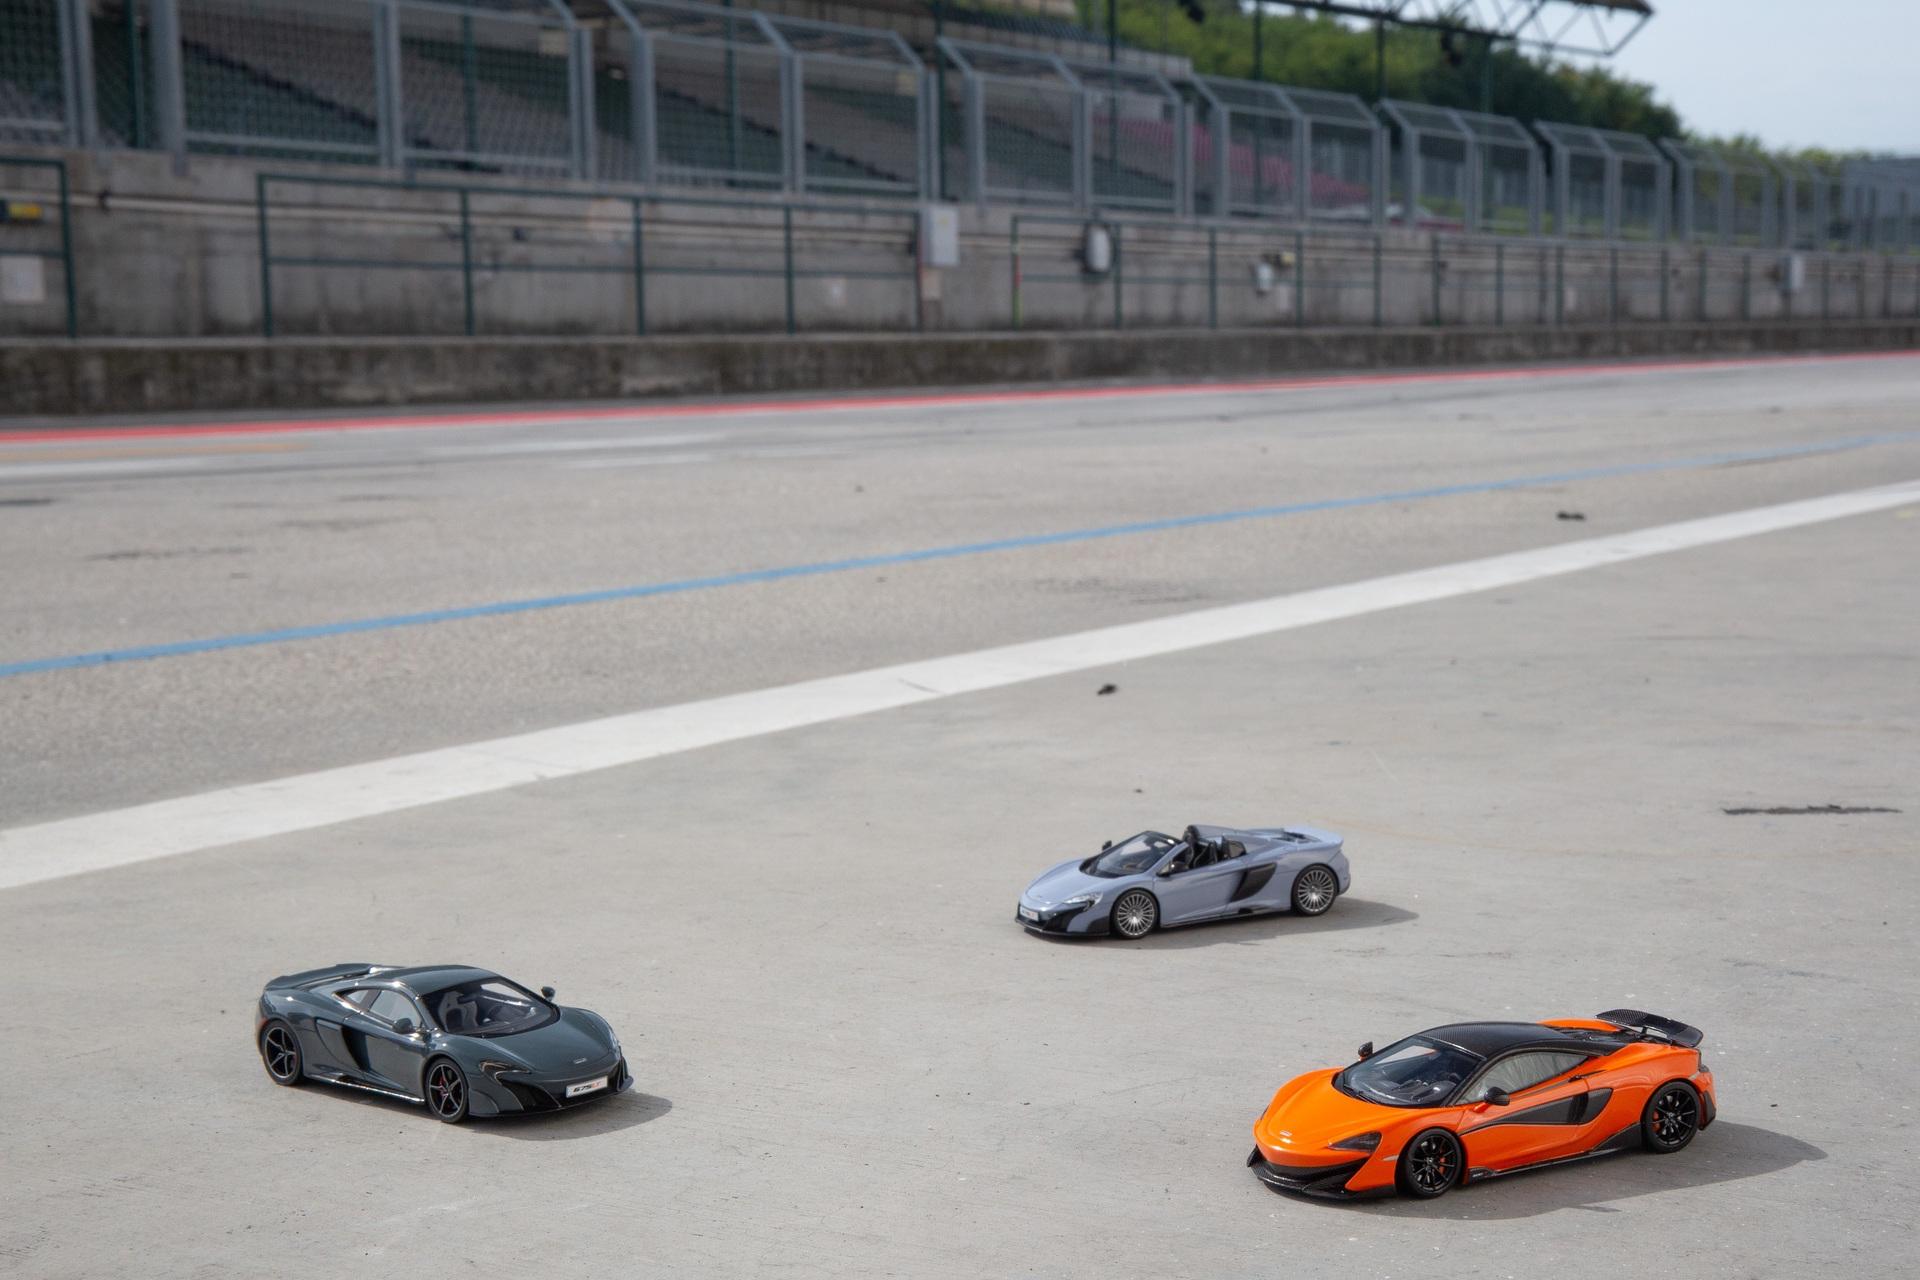 McLaren_600LT_miniature_0003